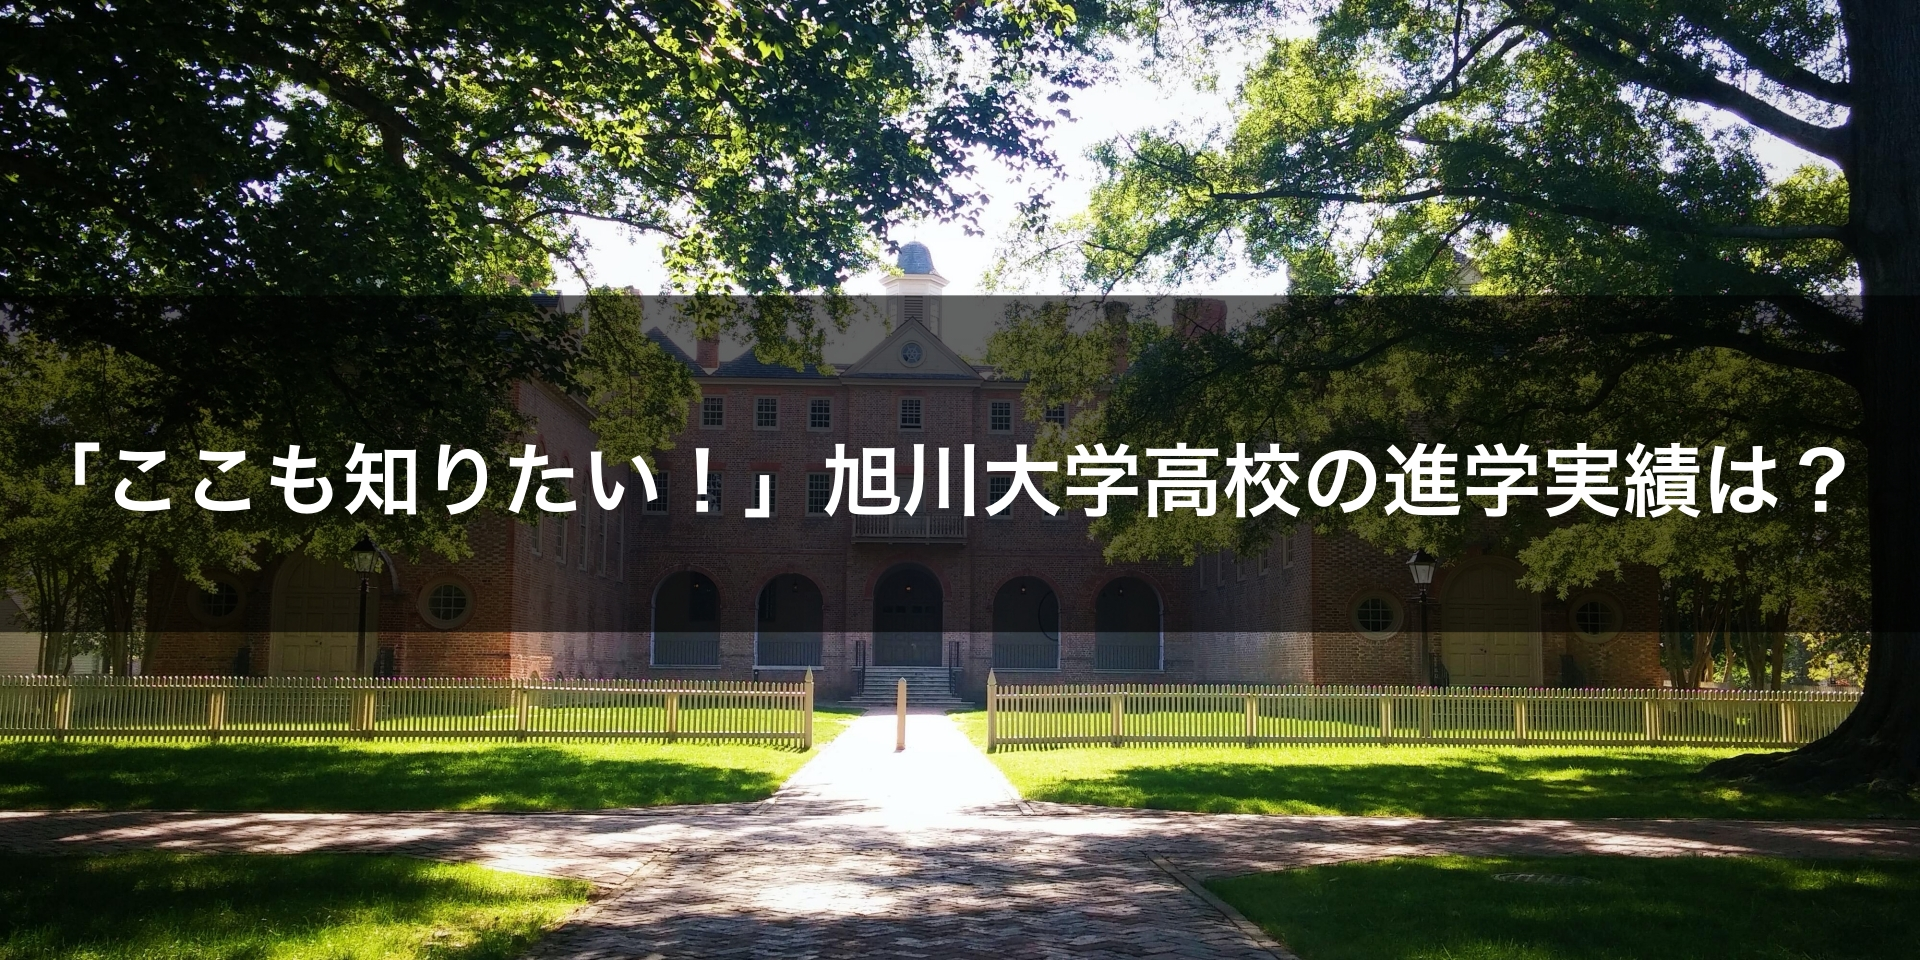 旭川大学高校高校の進学実績は?